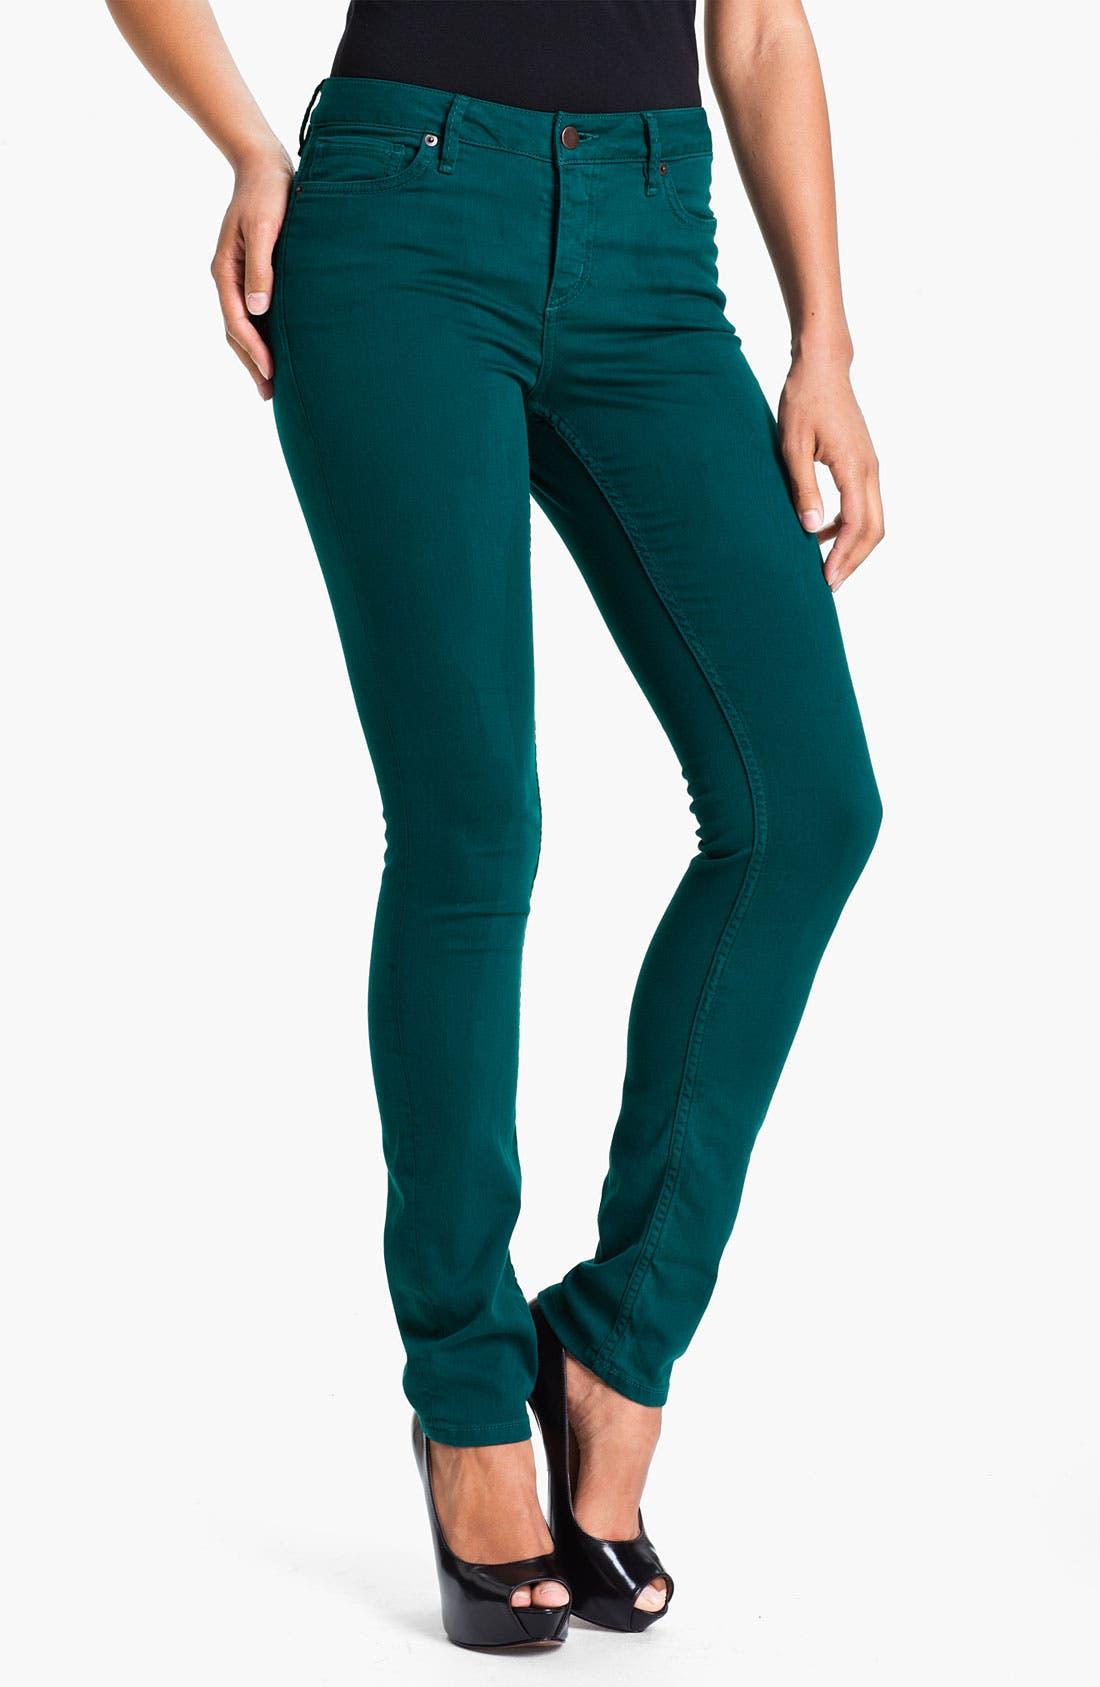 Main Image - Christopher Blue 'Sophia' Skinny Twill Jeans